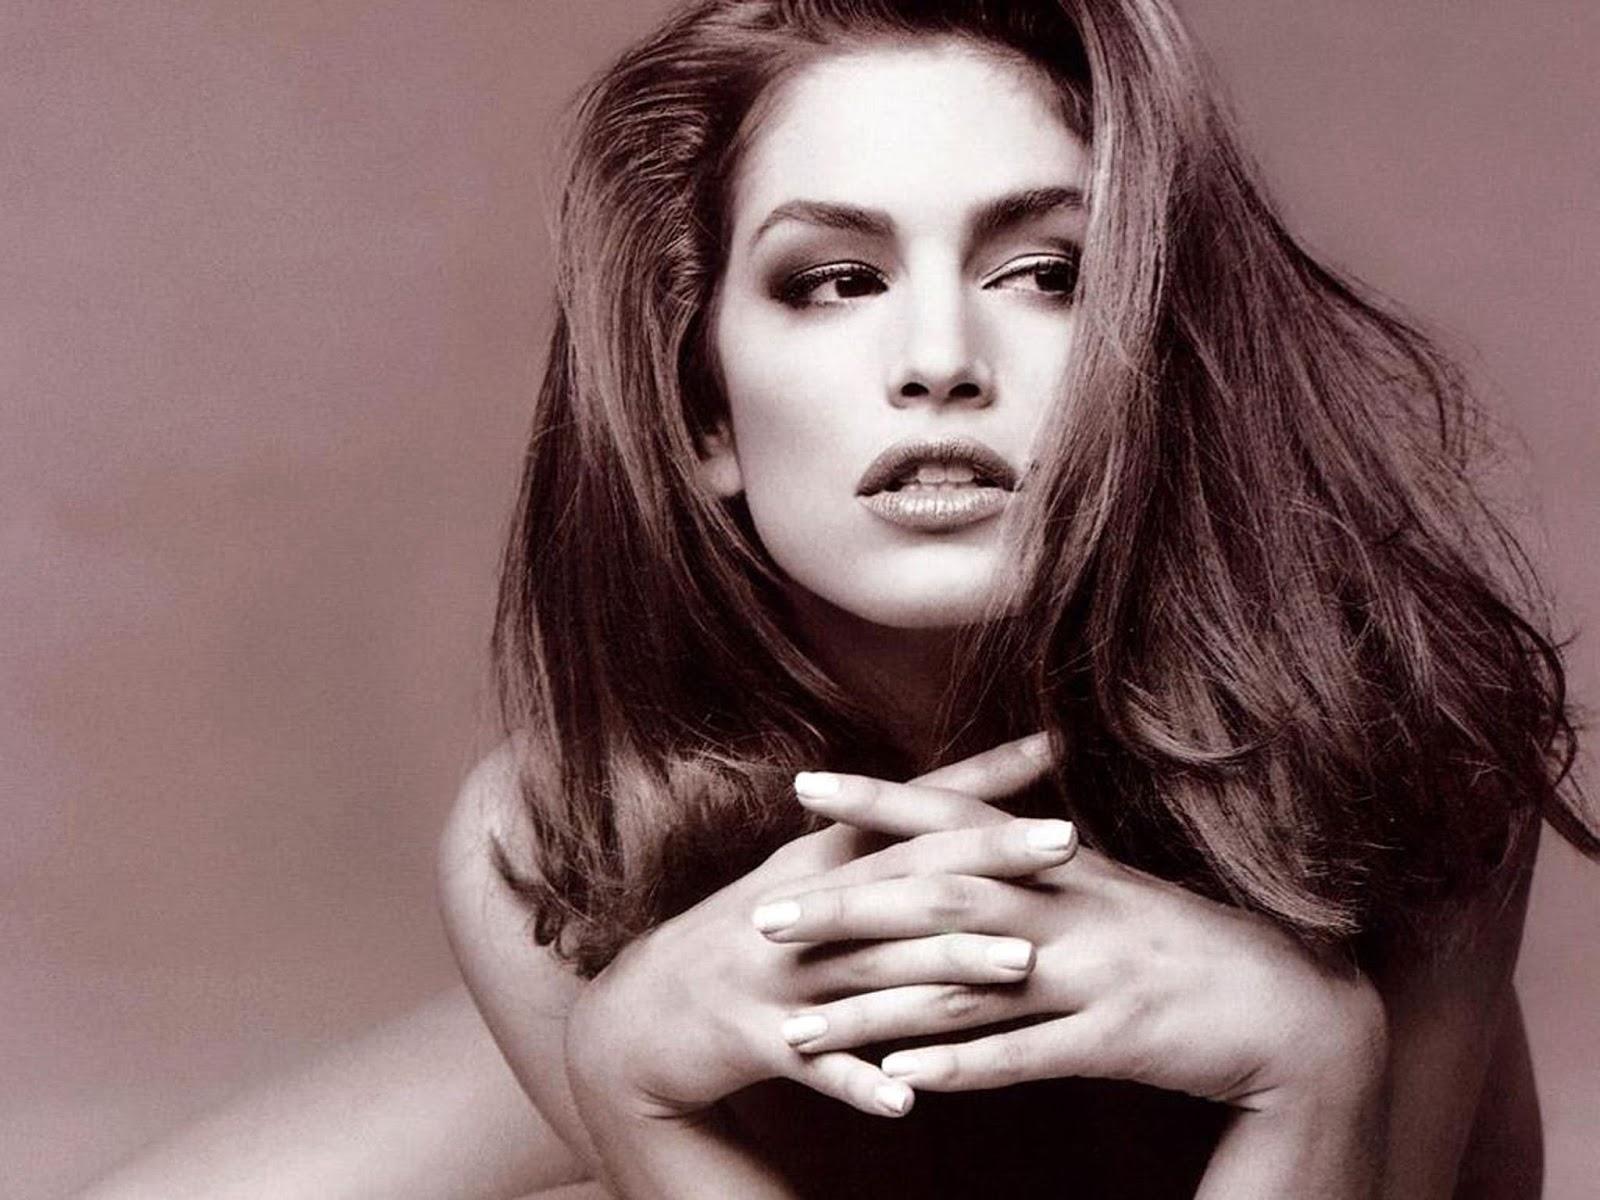 Eniwhere Fashion - Top Models 90's - Cindy Crawford